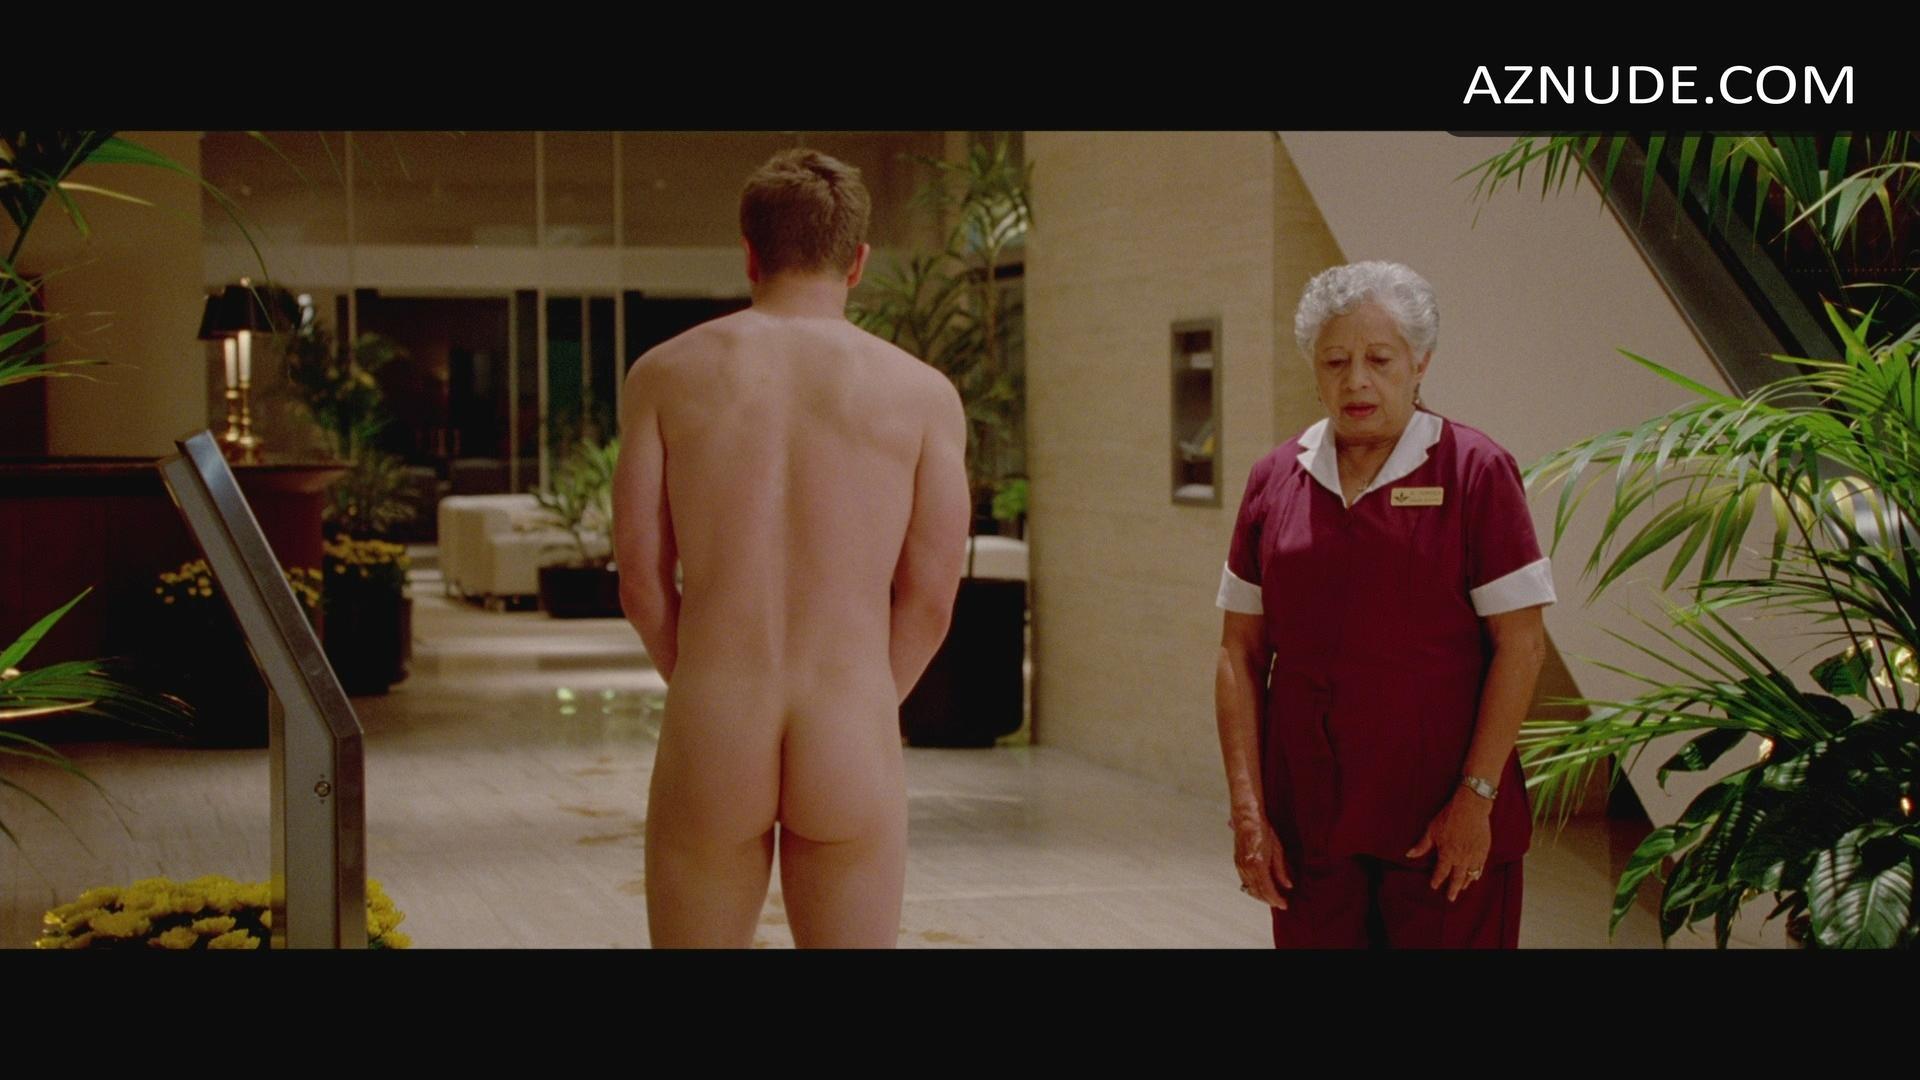 MATT CZUCHRY Nude  AZNude Men